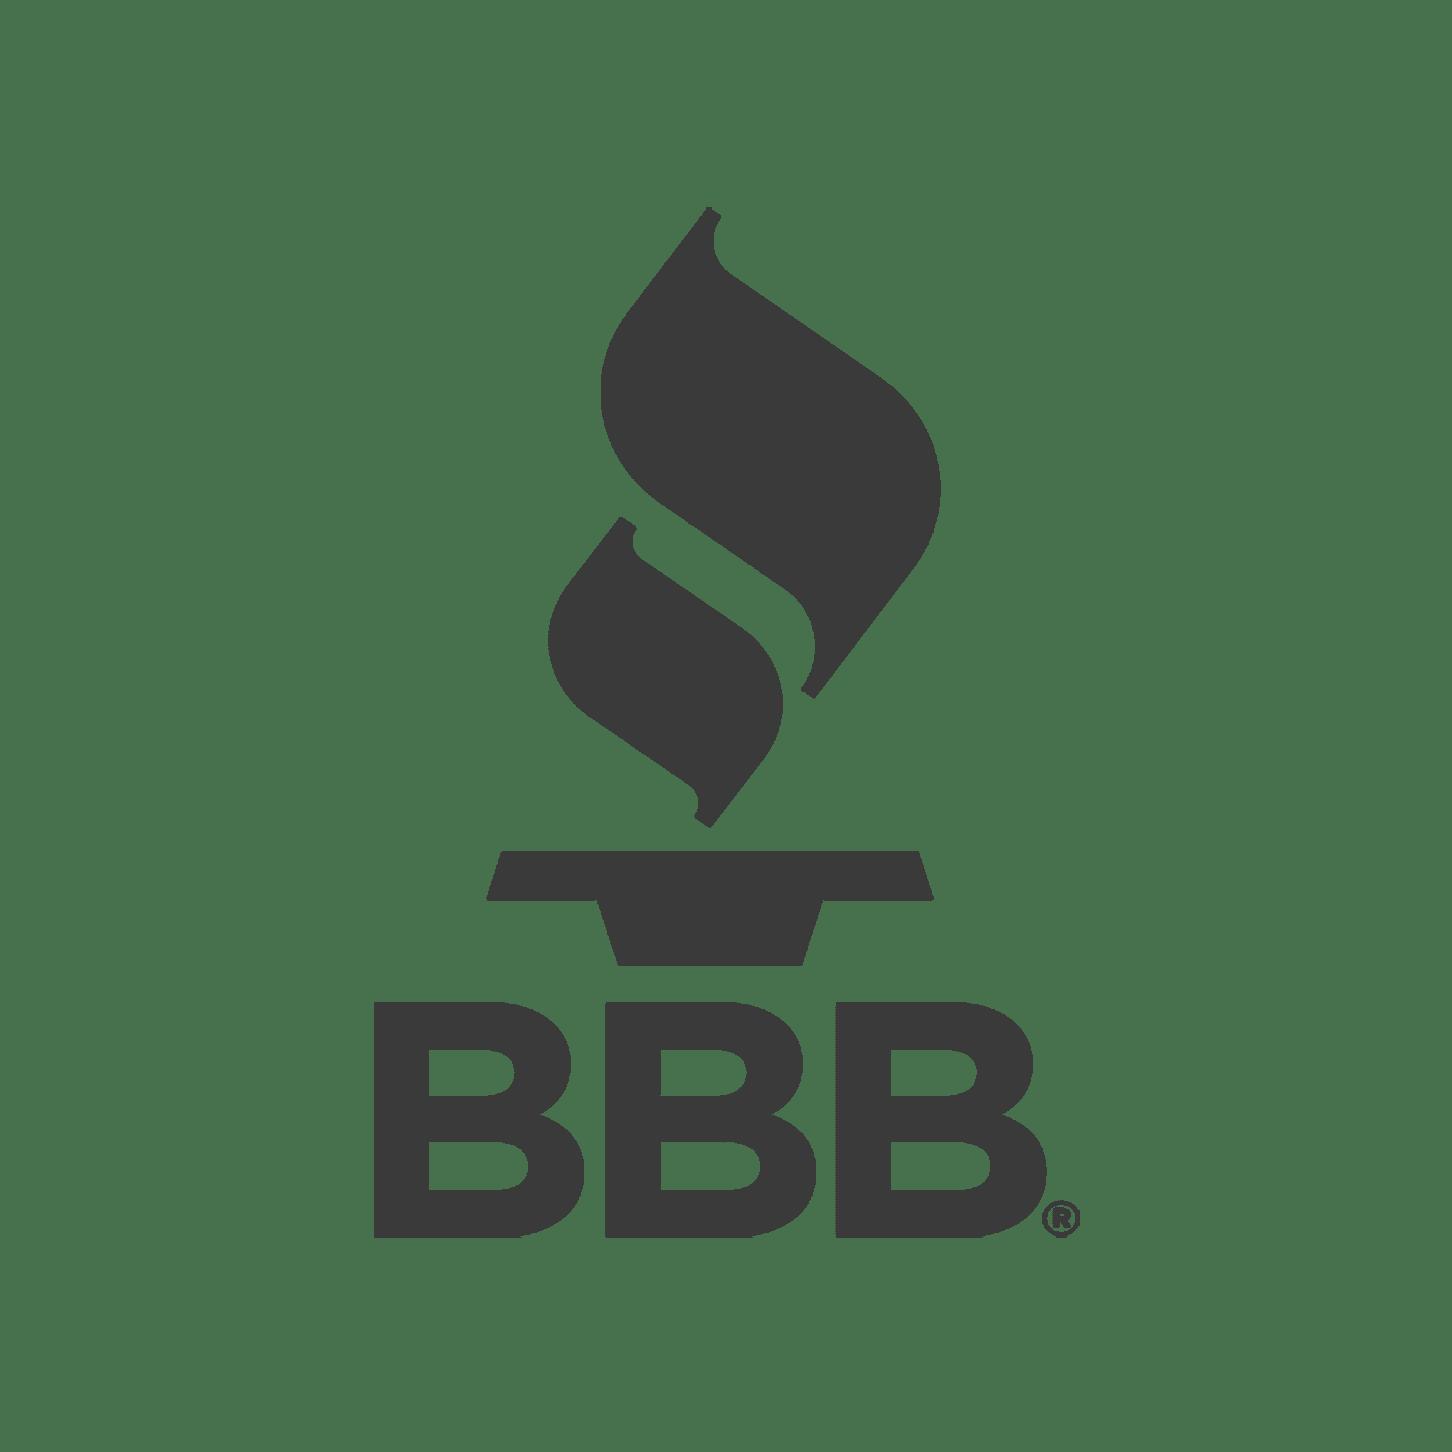 bbb_square copy (1)